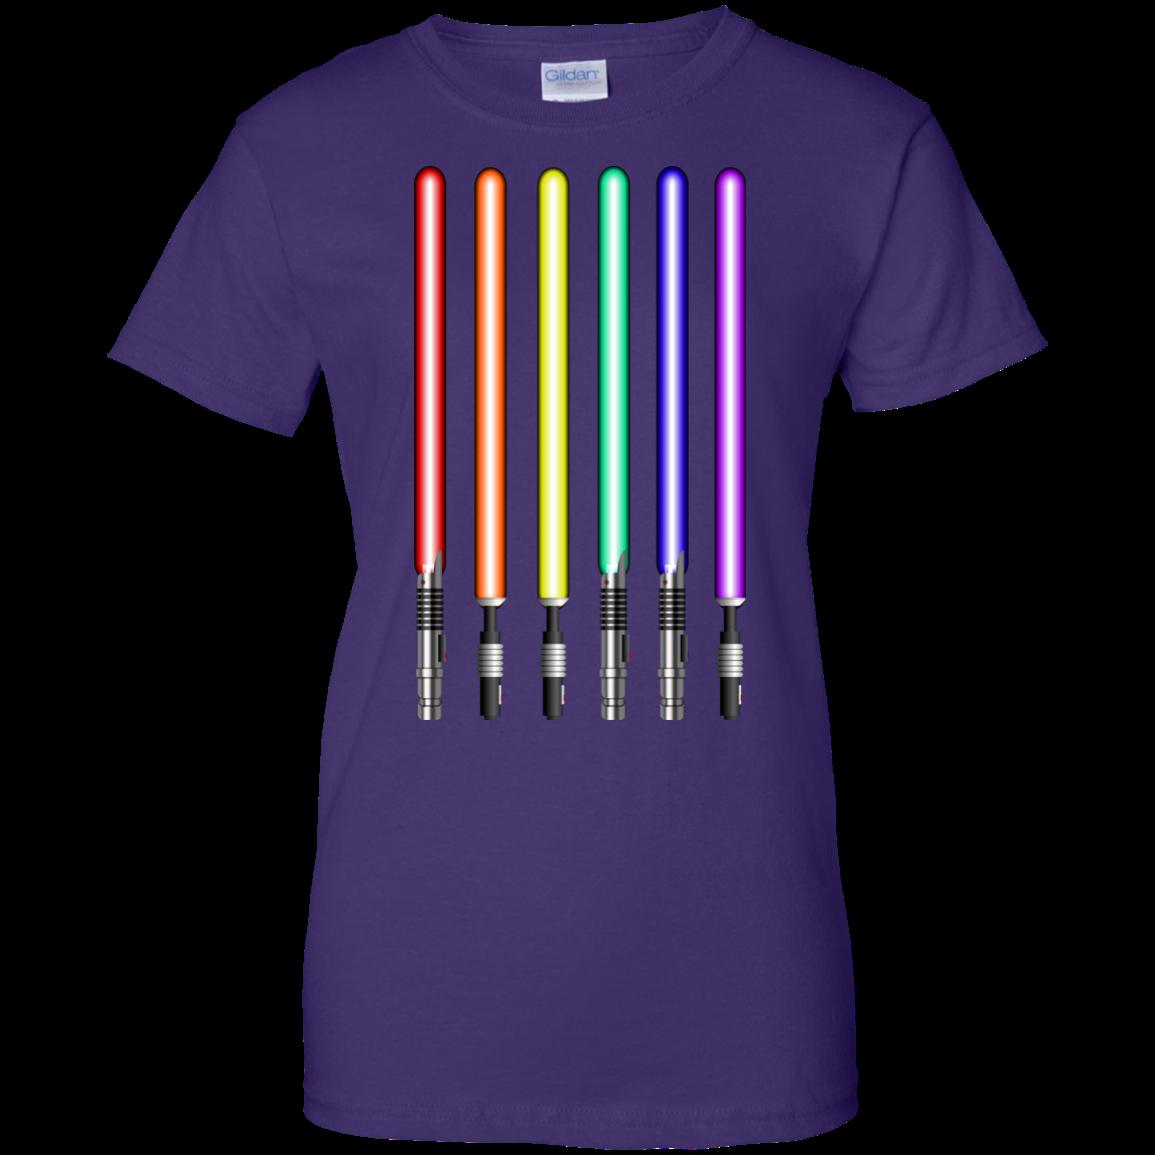 image 884px Star Wars Lightsaber Rainbow Shirt (Tee Hoodies Tank Top)